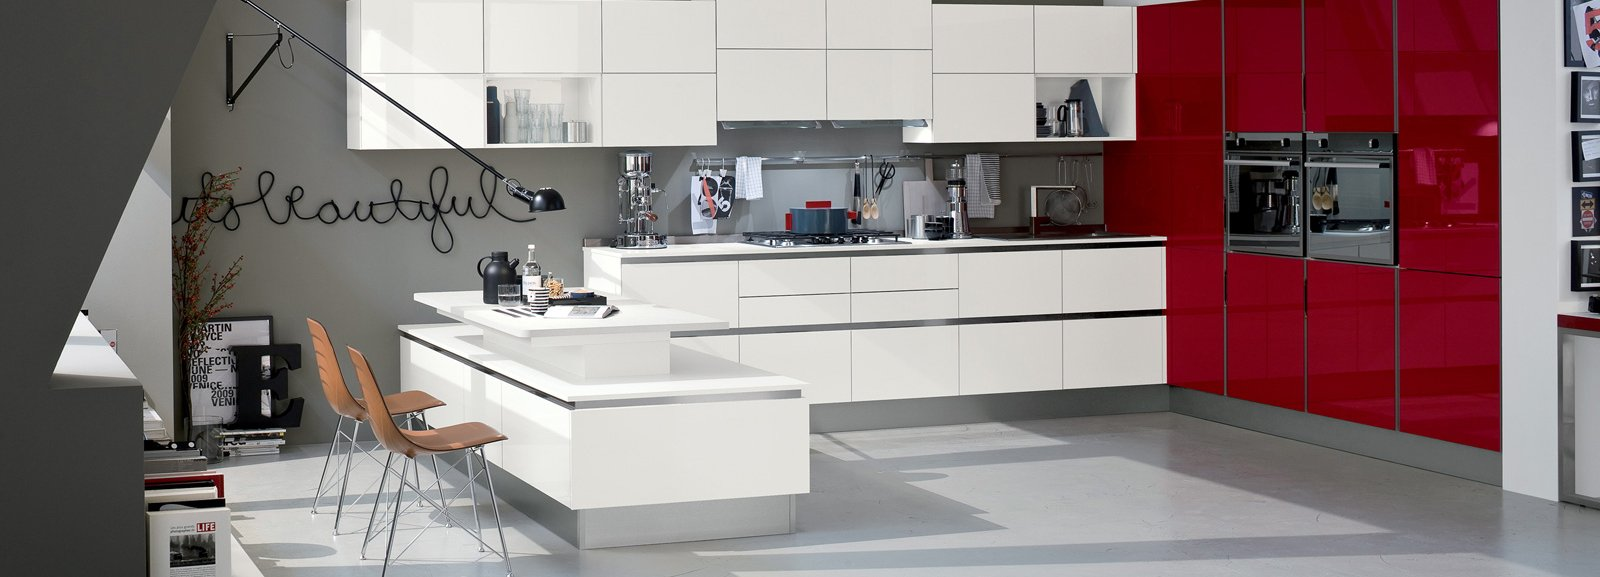 Cucina Like Mondo Convenienza. Mondo Convenienza Cucine Foto Design ...